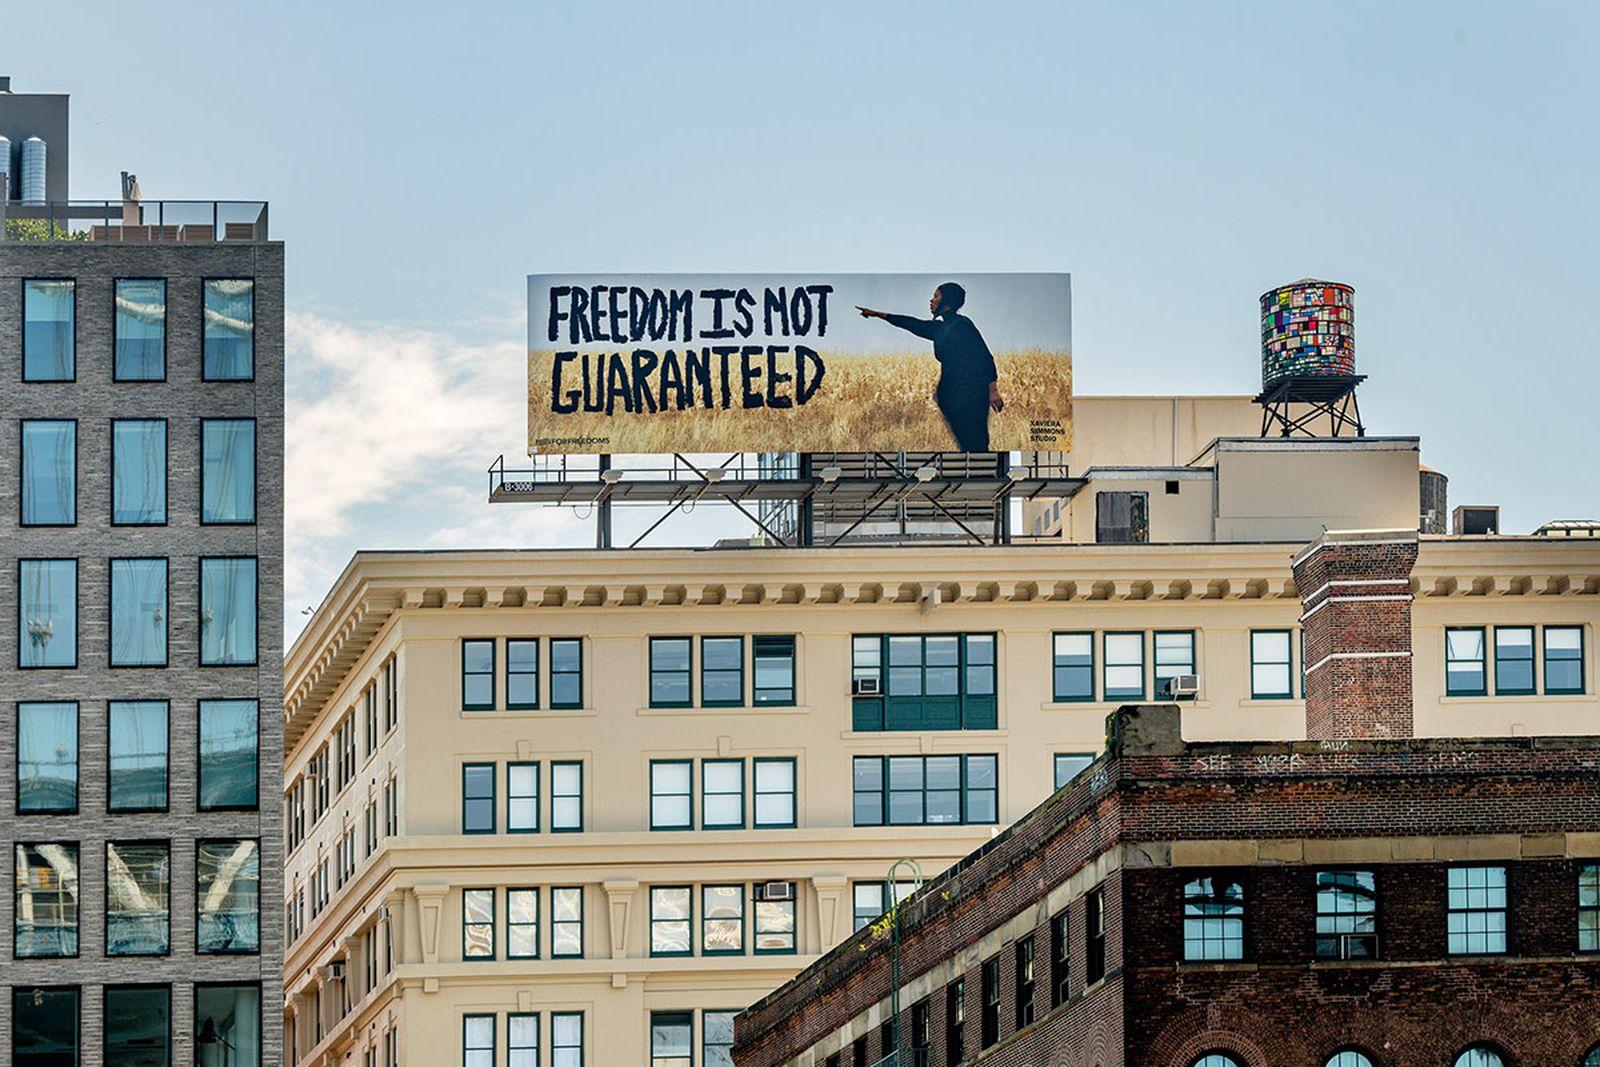 for-freedoms-billboard-wide-awake-2020-main01